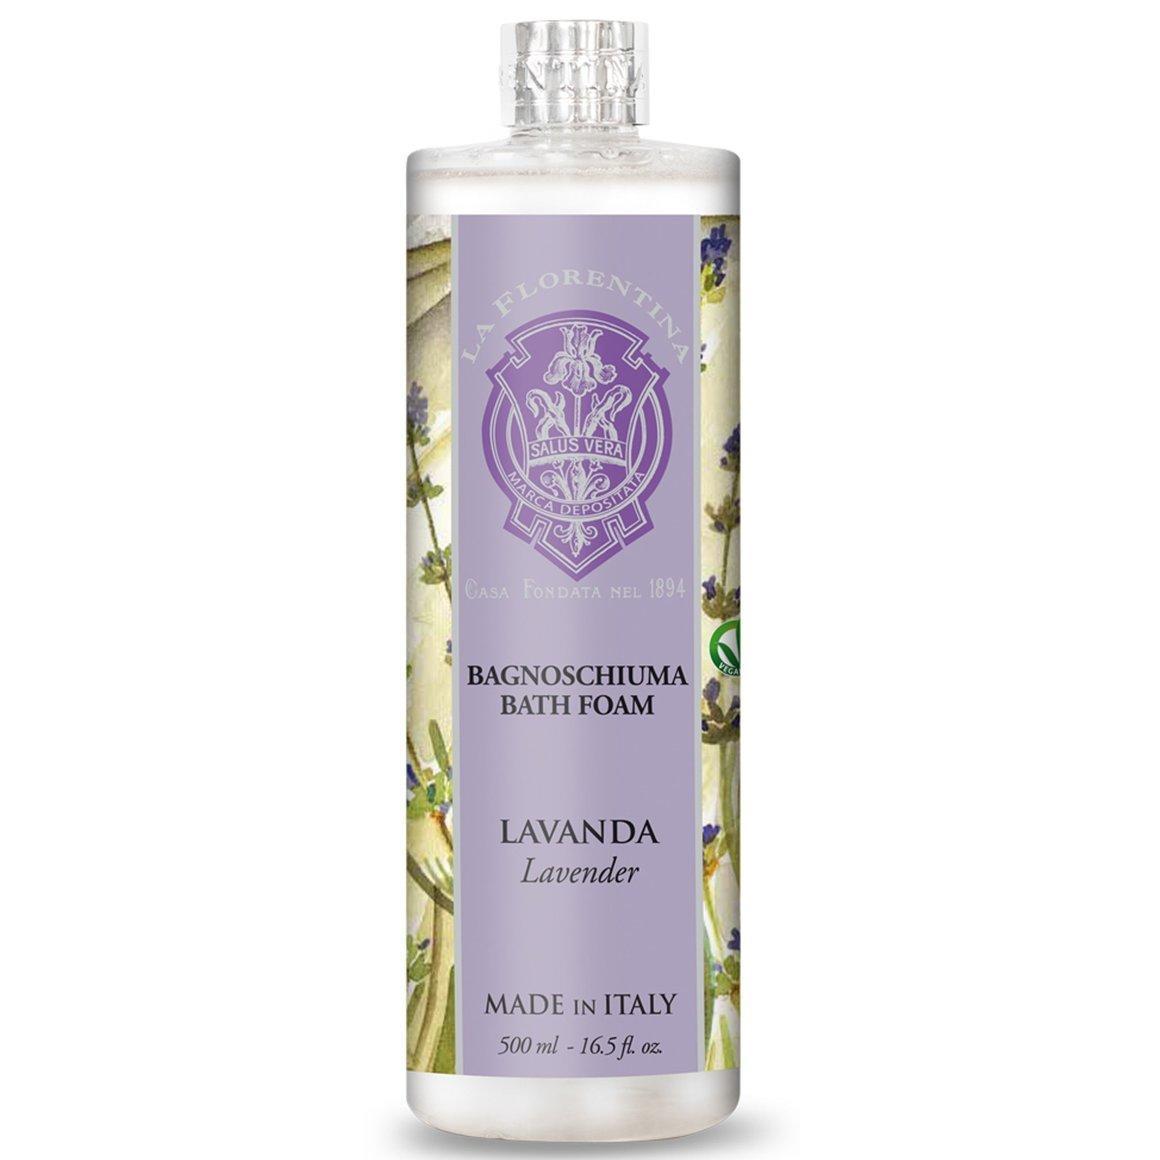 Florentina Lavender Bath Foam 500ml   Trada Marketplace